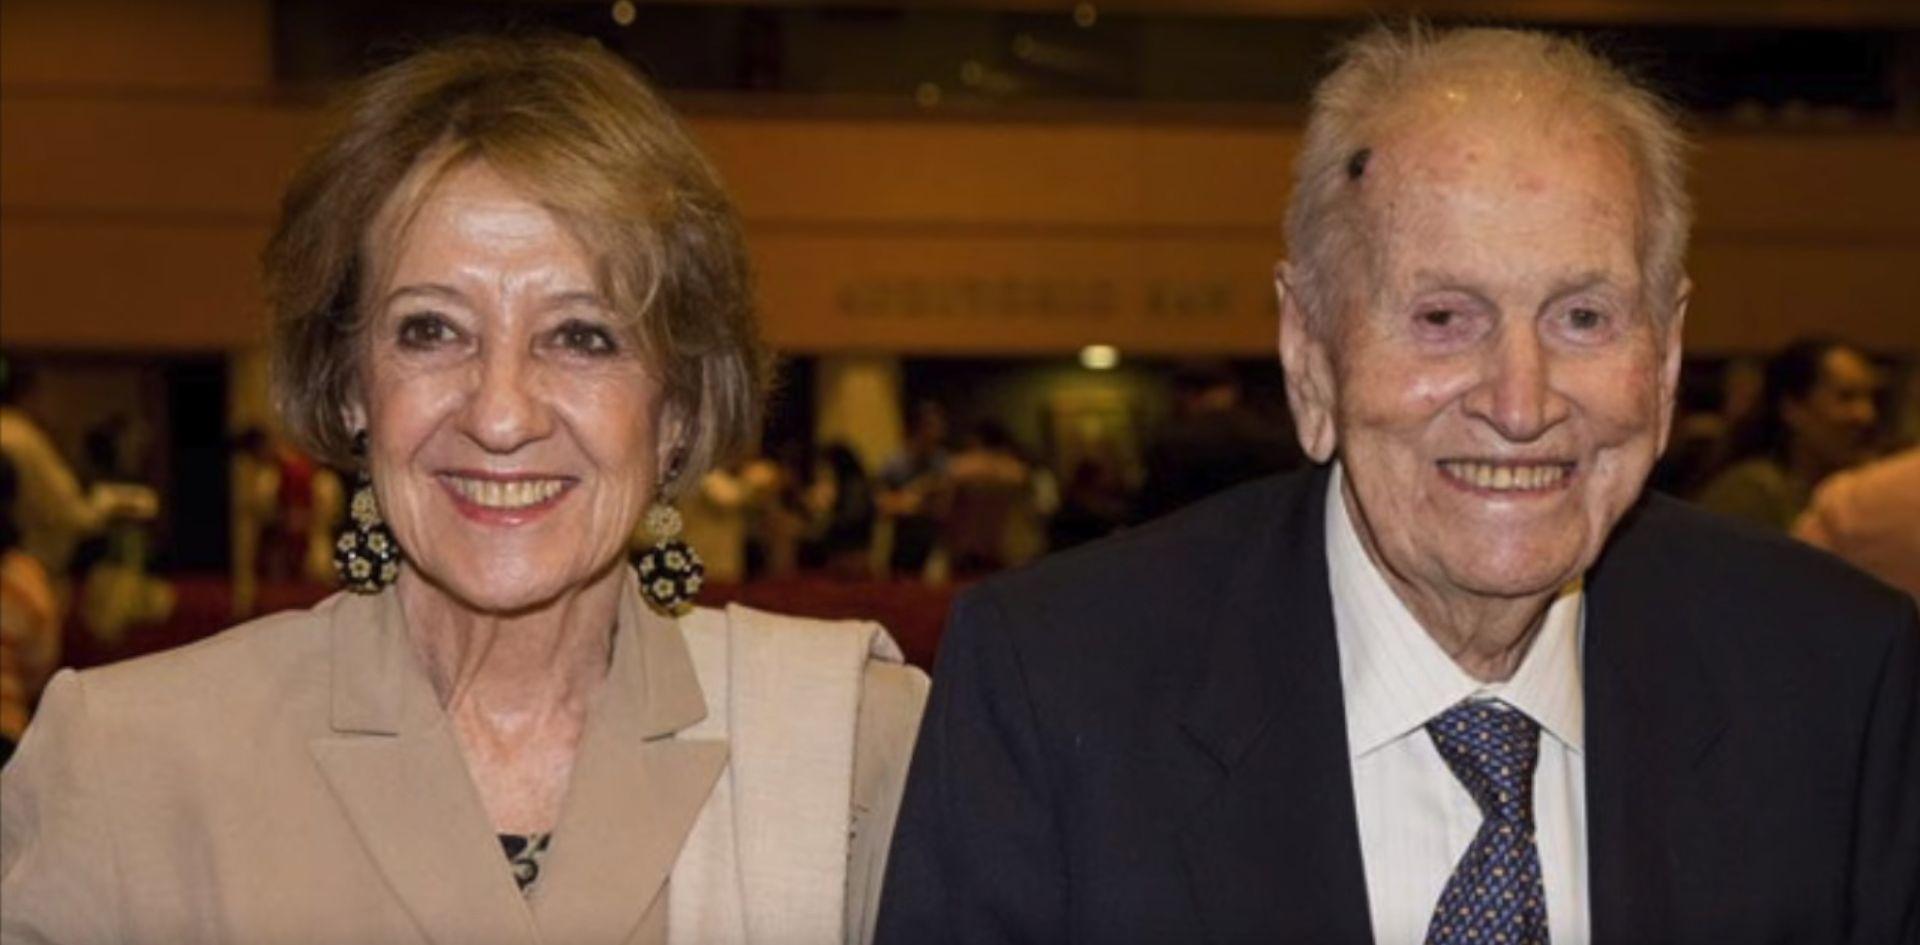 Umro otac nizozemske kraljice, kontroverzna figura argentinske politike